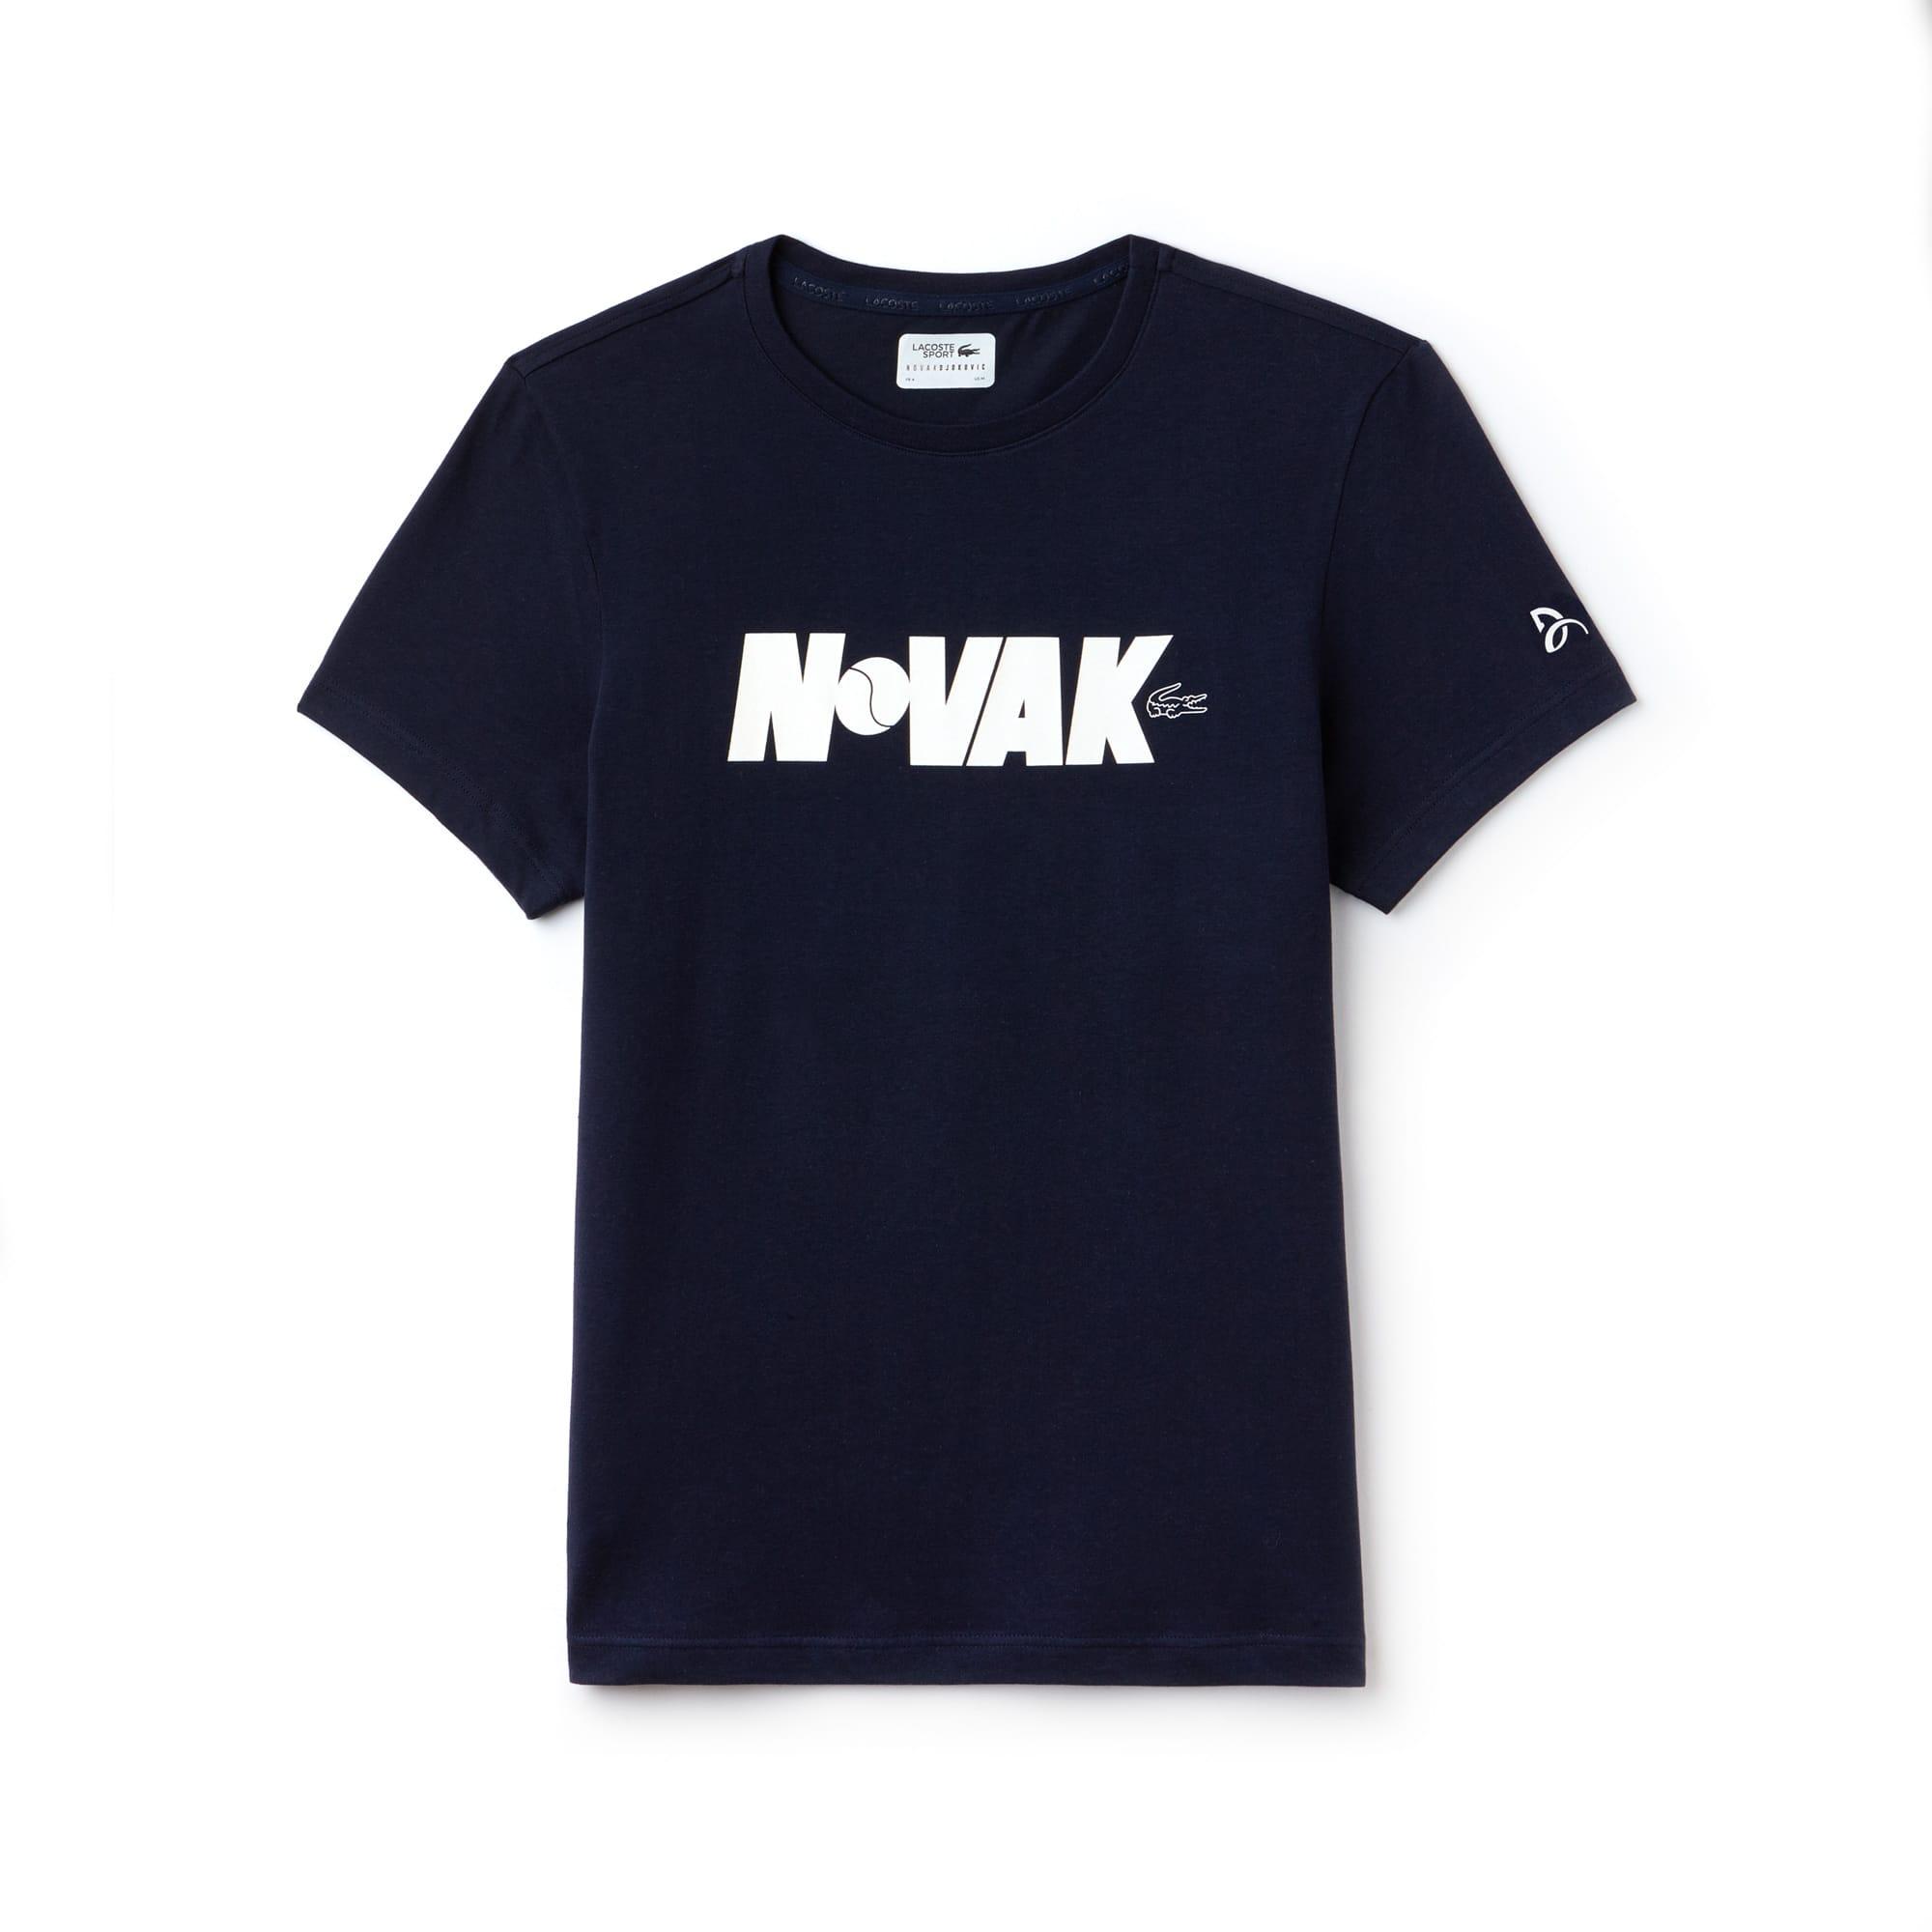 Men's SPORT Technical T-Shirt - Novak Djokovic Supporter Collection